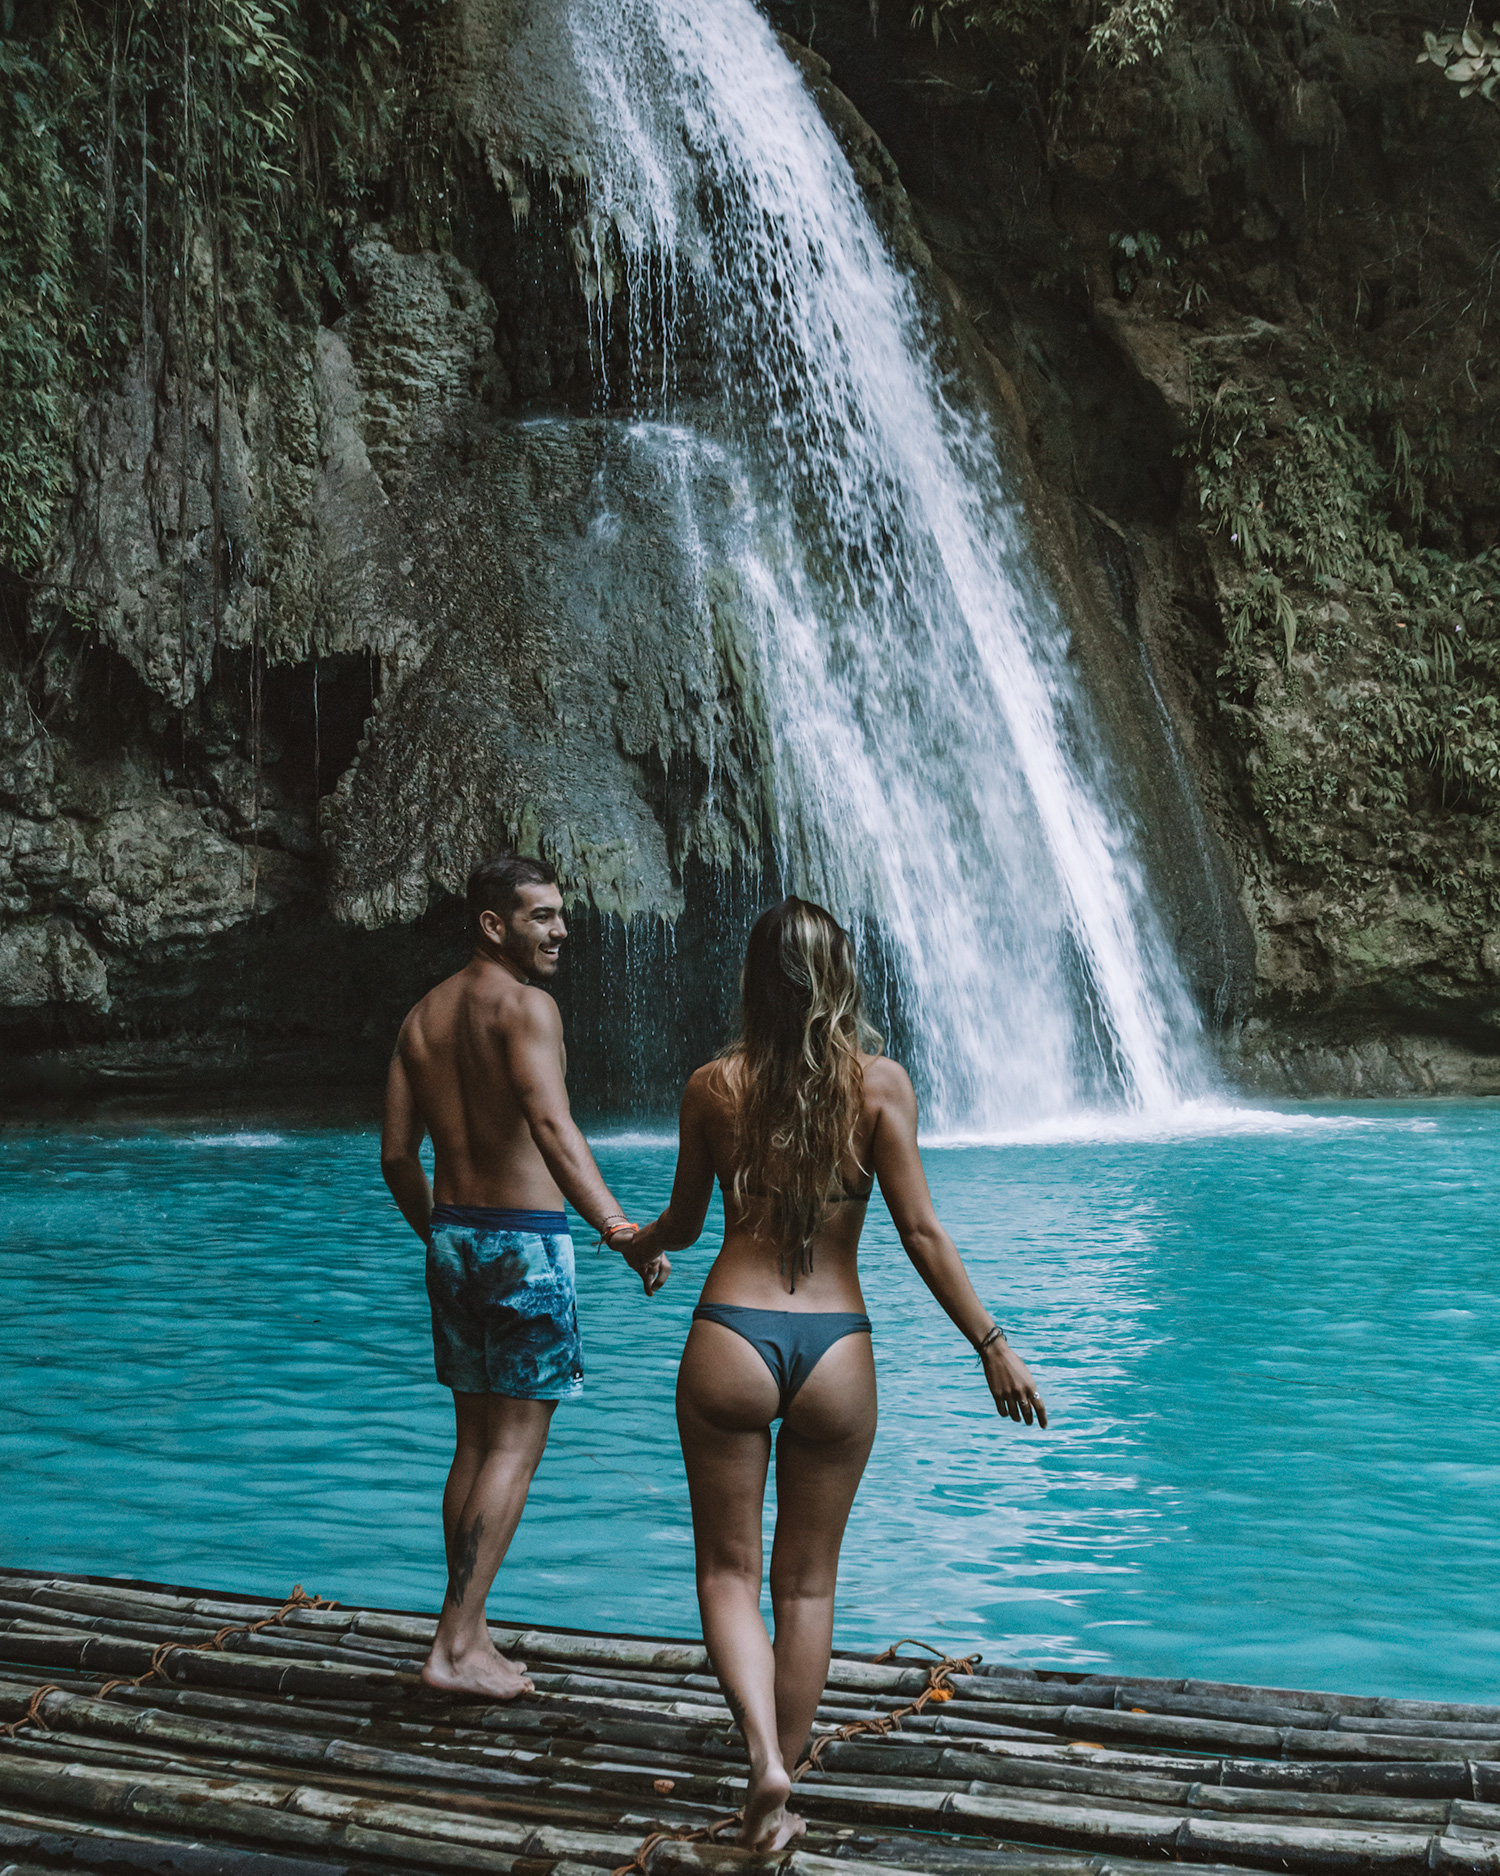 cebu waterfall guide cebu philippines couple kawasan falls asia travel guide